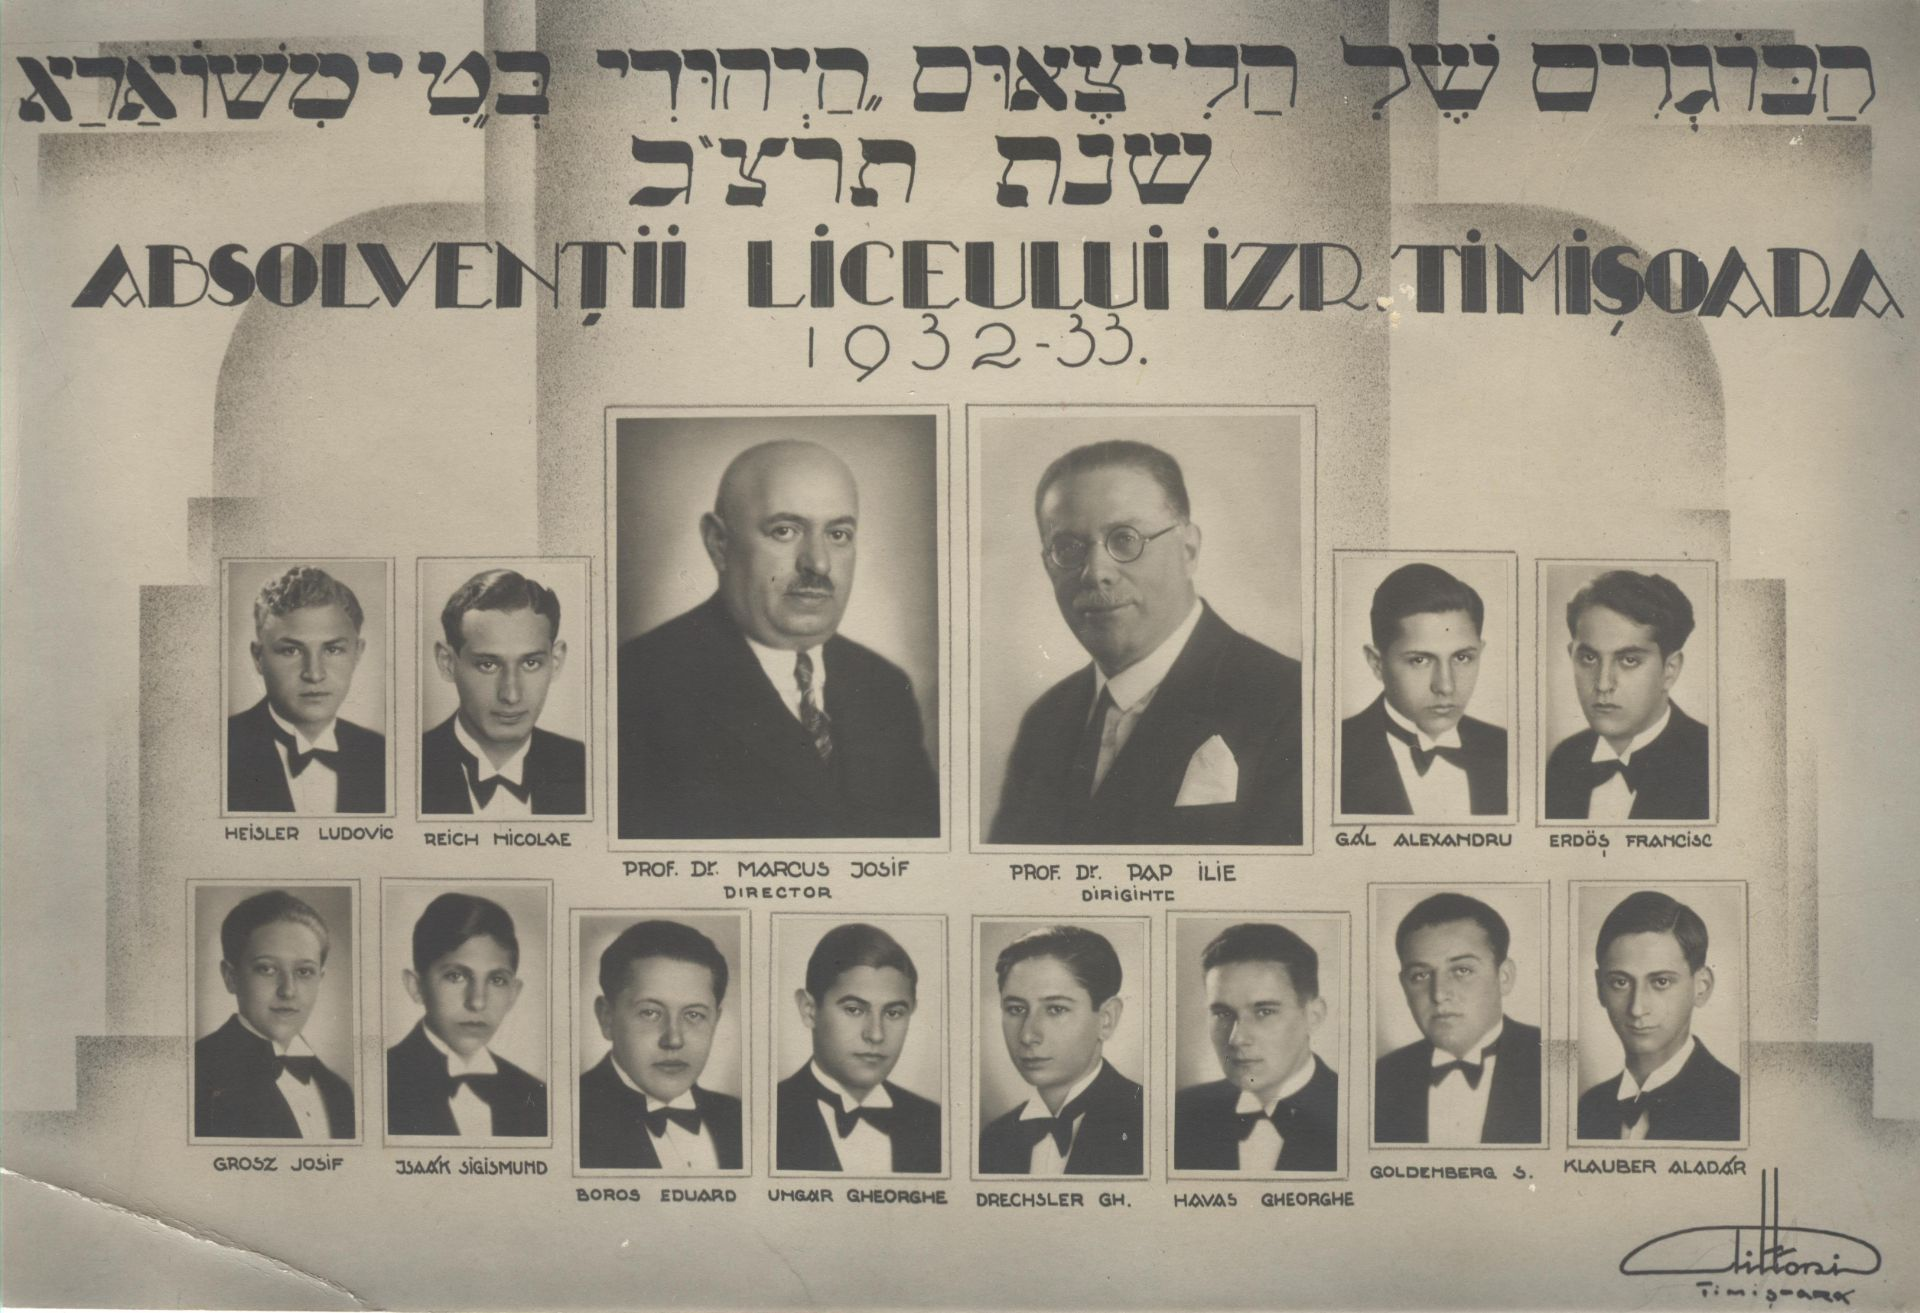 Sigismund Izsák, absolventul Liceului Israelit, 1932-1933